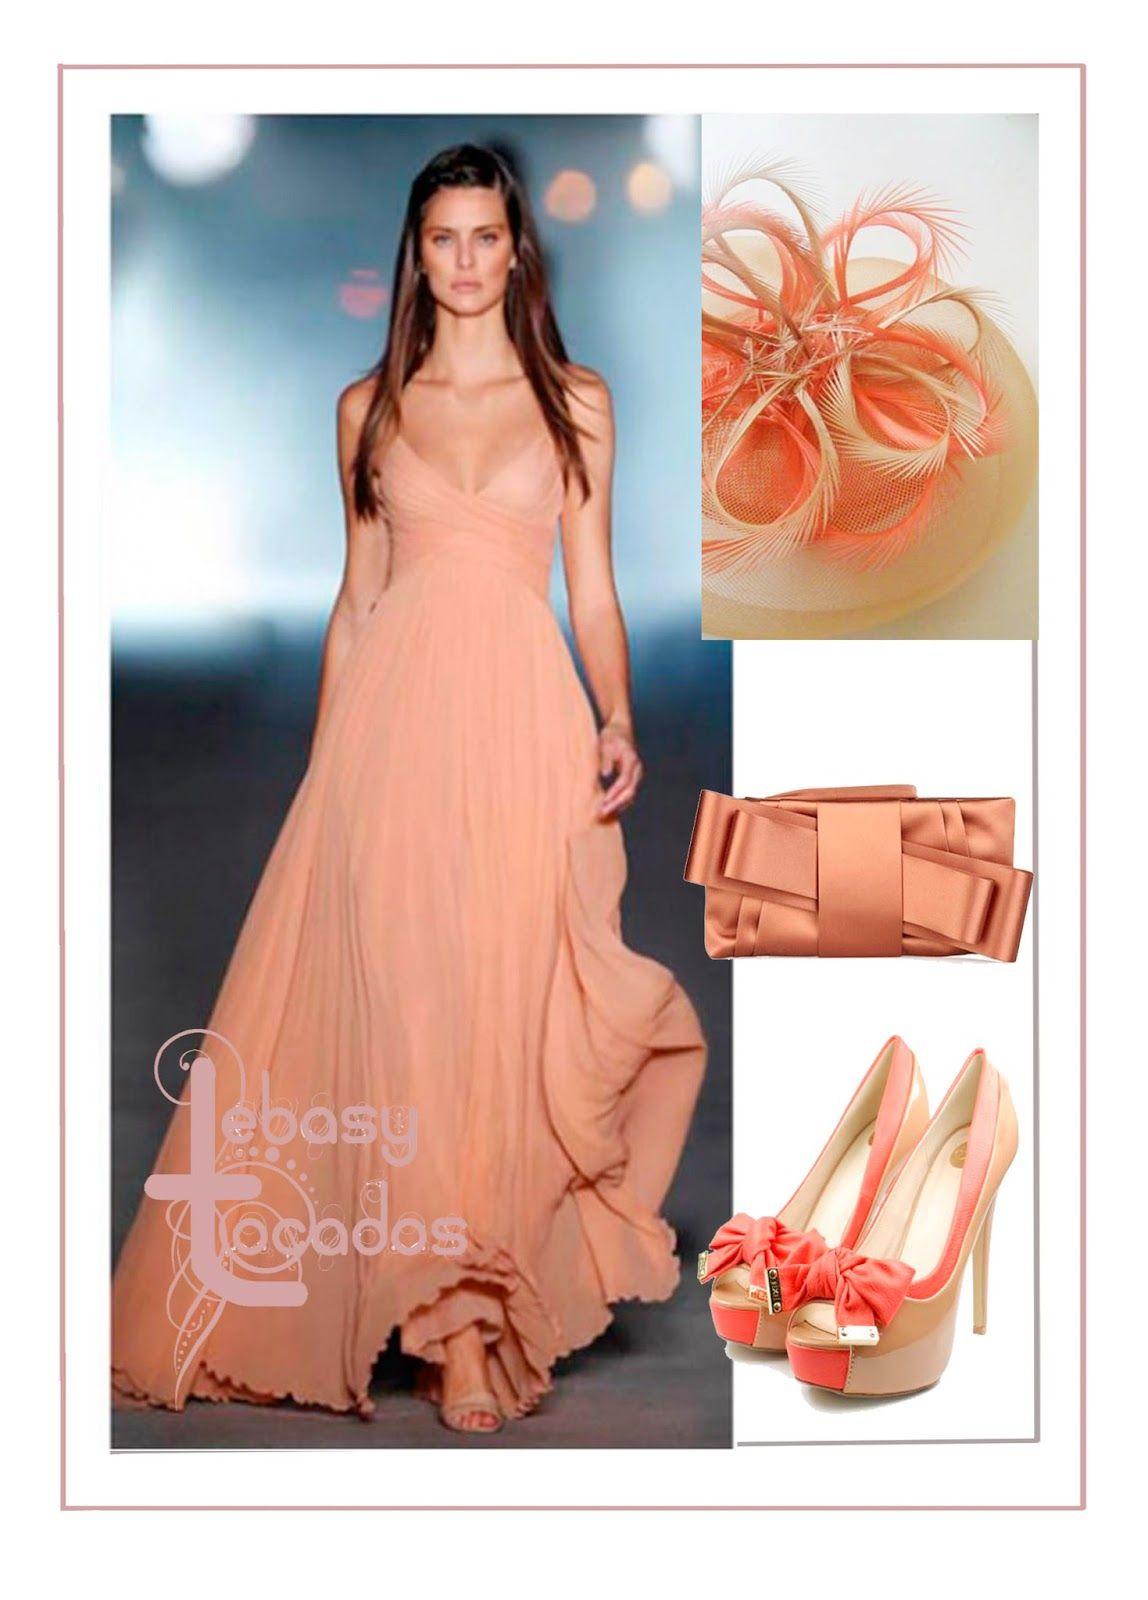 Amara de la Cruz Retro Raso Salmón 41  Negro DVS Shoes Portal  Zapatillas para Mujer 7tb8E